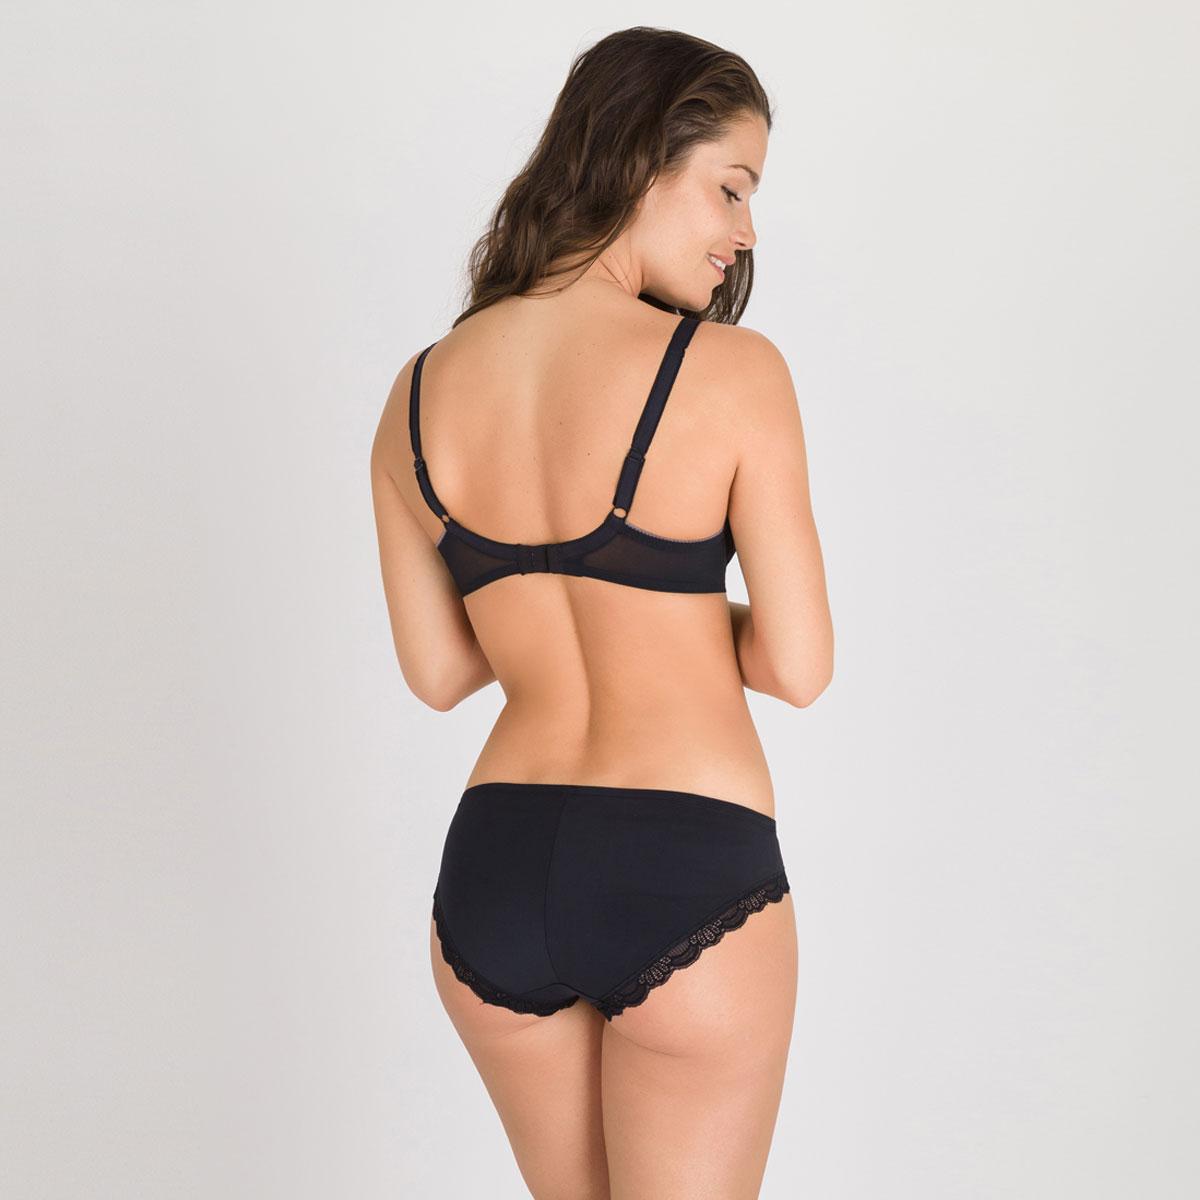 Soutien-gorge foulard noir – Invisible Elegance-PLAYTEX